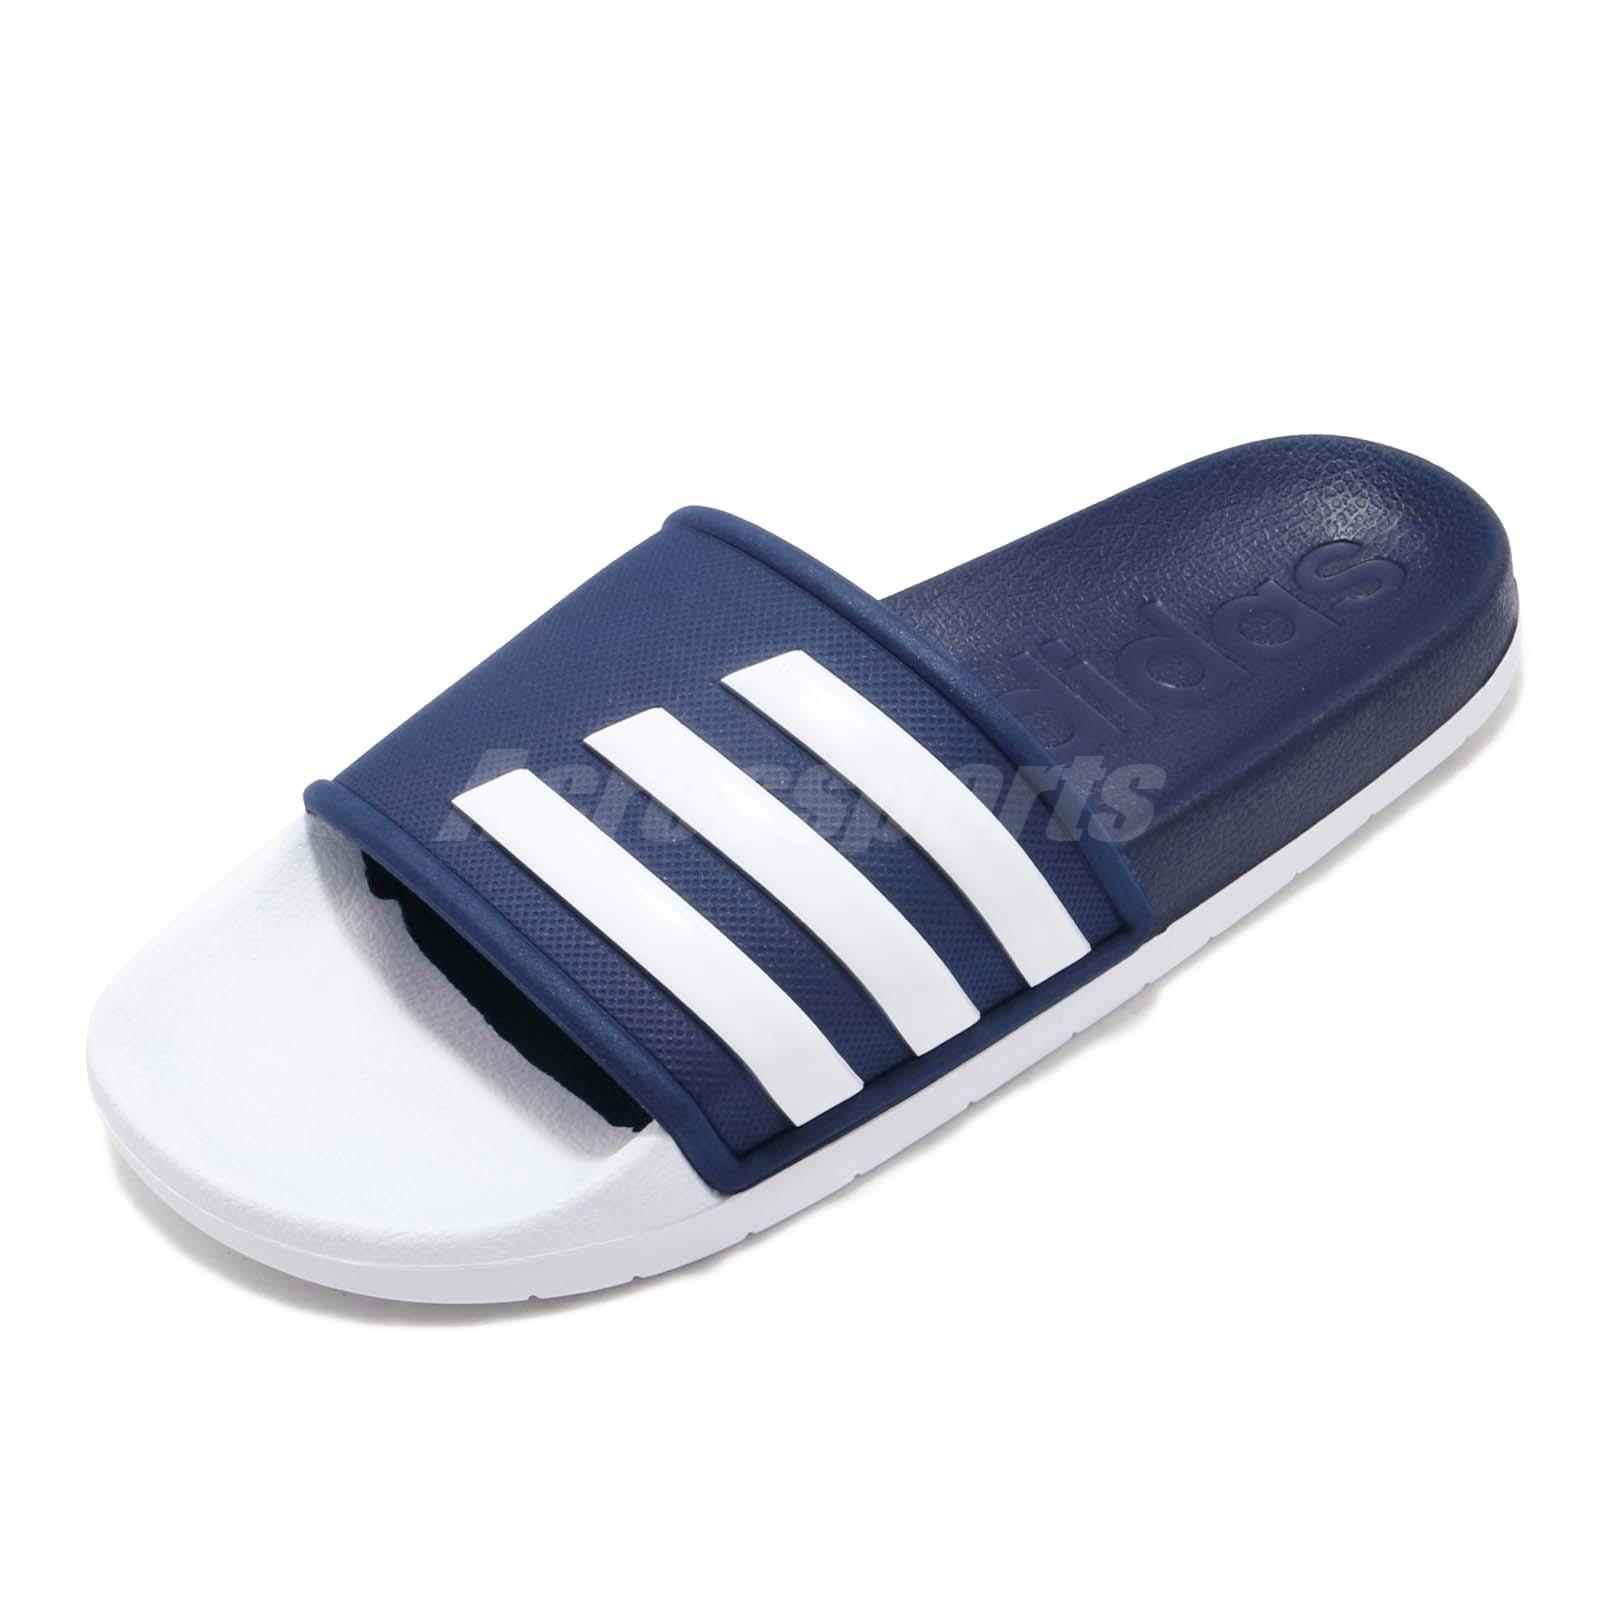 Détails sur adidas Adilette TND Slides Dark Blue White Men Sports Sandals Slippers F35436